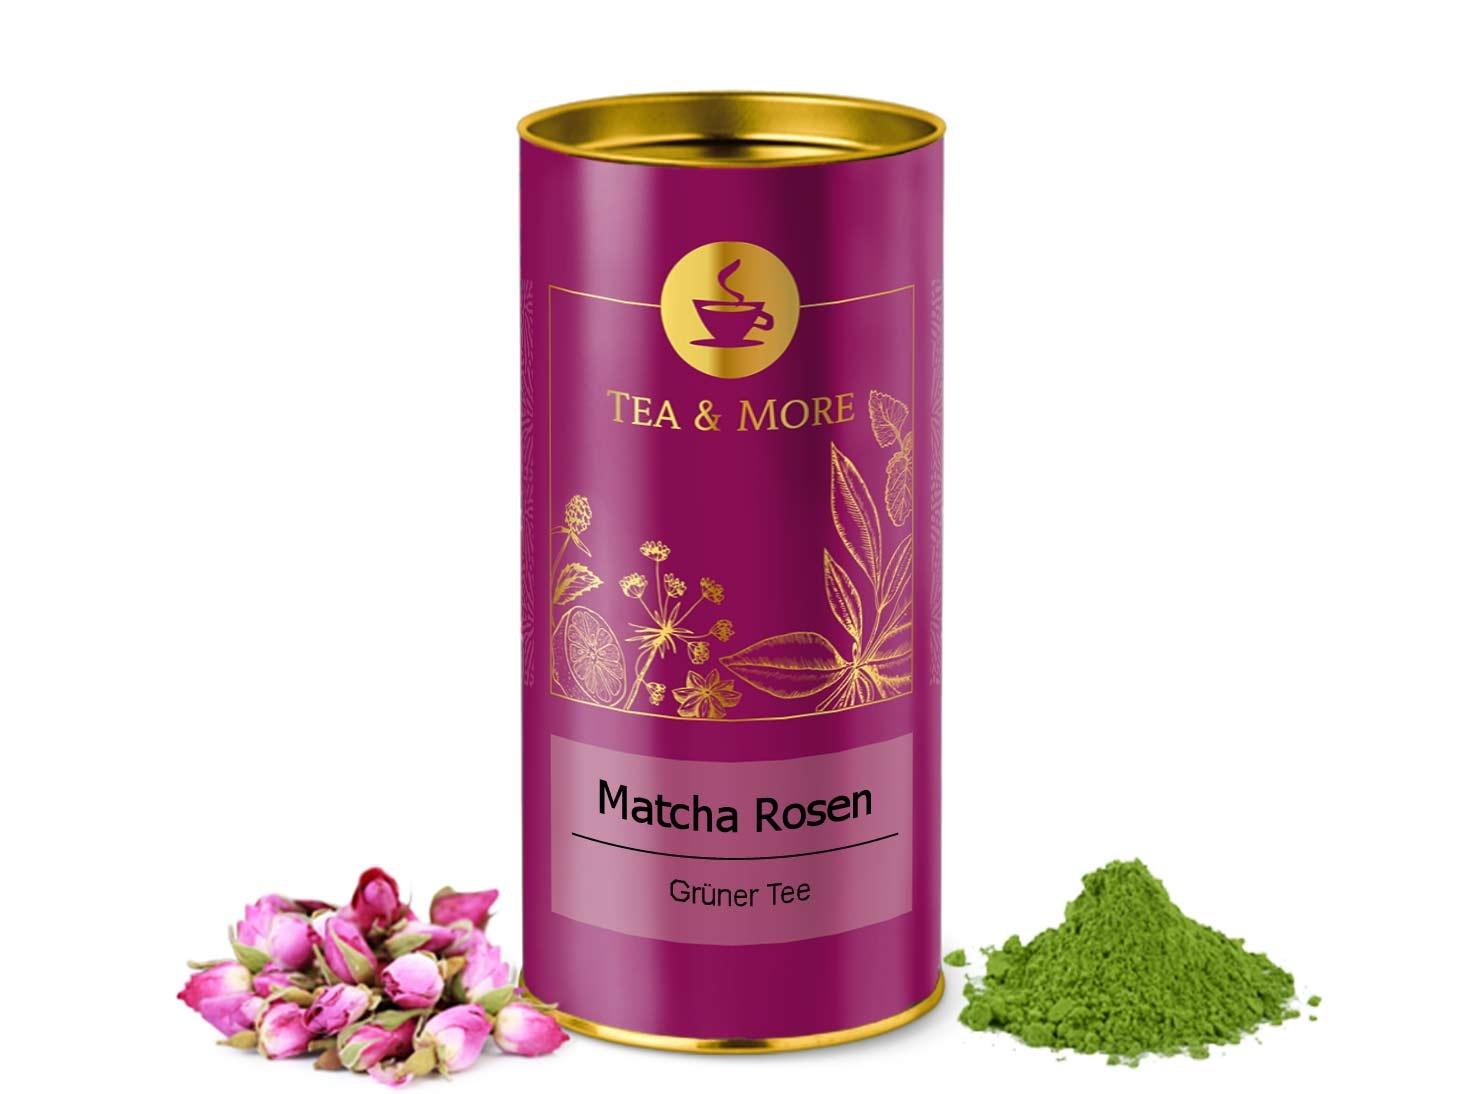 Matcha & Rosen